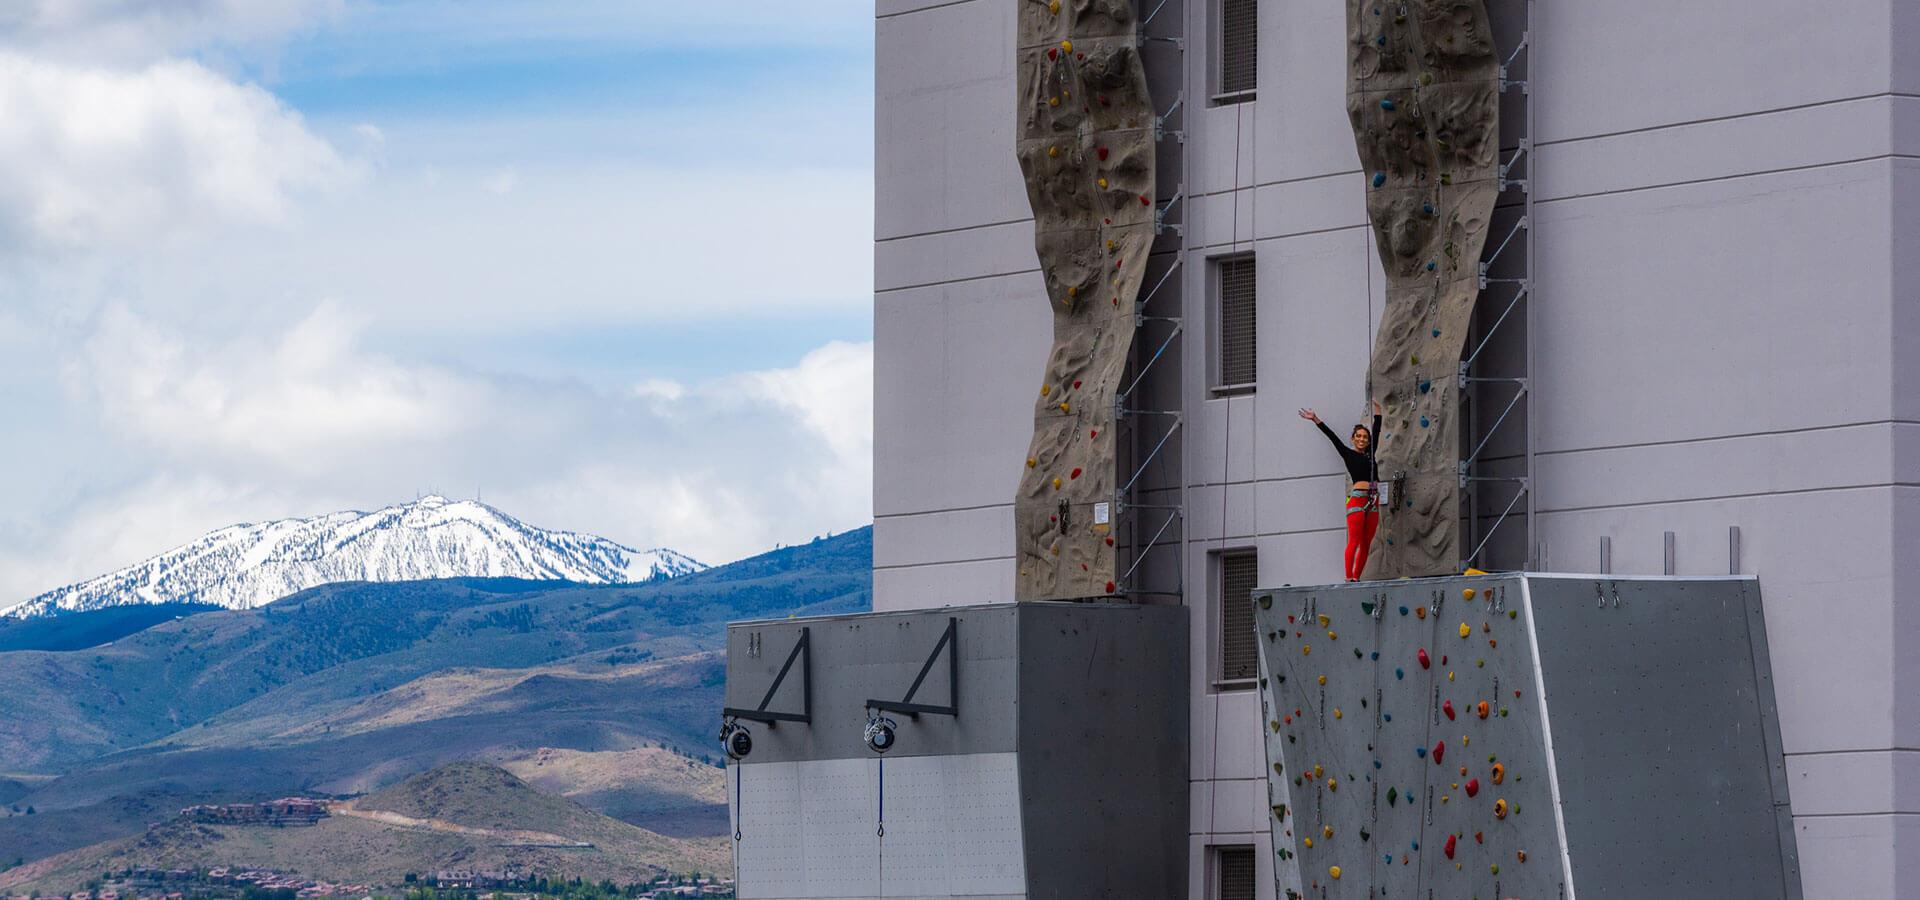 Whitney Peak Climbing Wall Downtown Reno